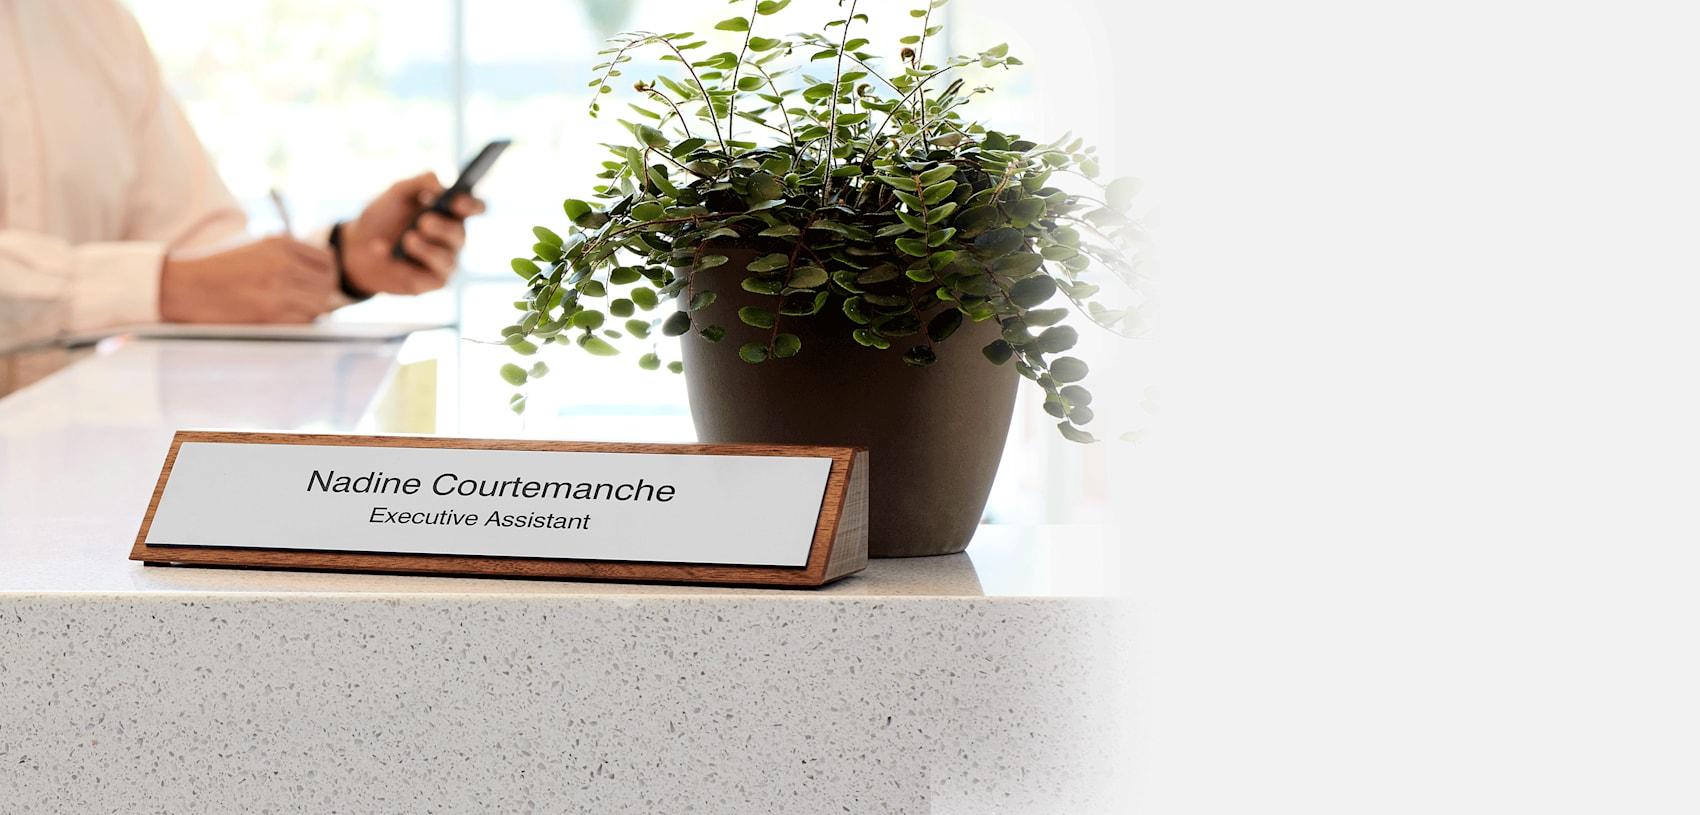 custom desk name plate for office Canada